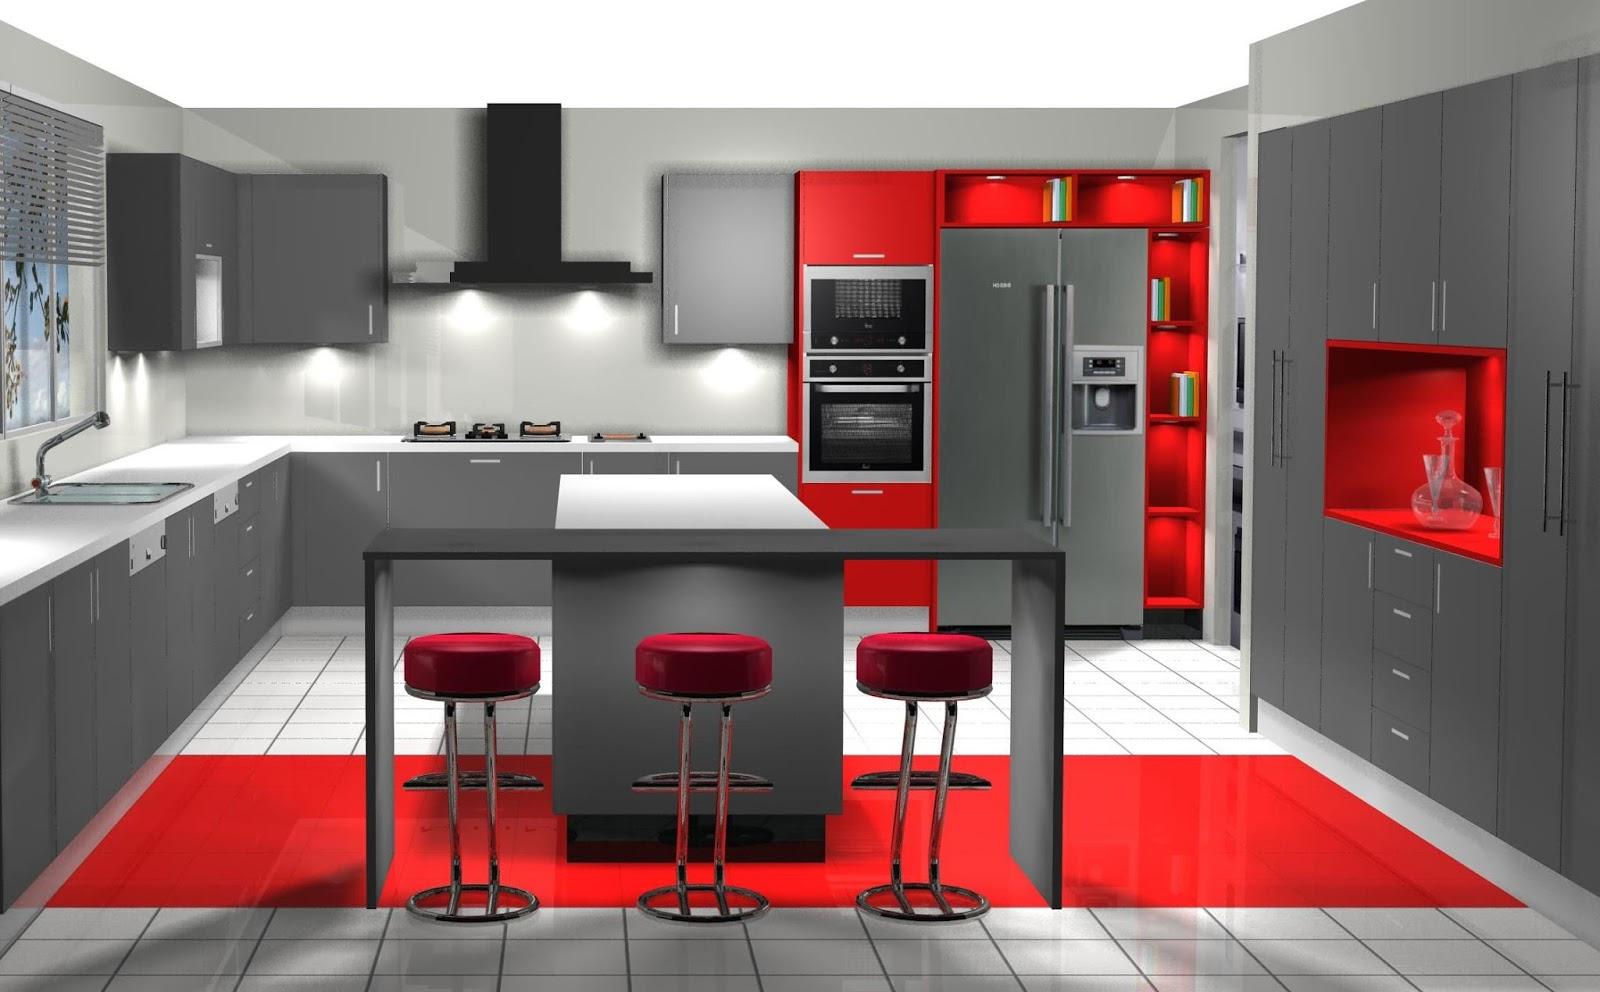 Disenos de muebles de cocina para armar for Planos muebles de cocina para armar